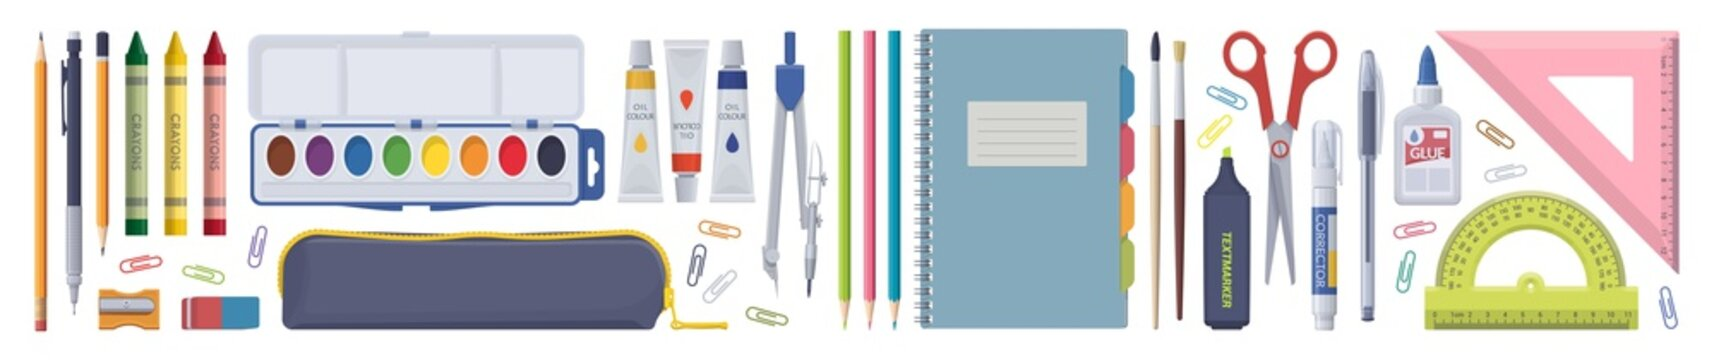 Stationery set. School items. Vector flat isolated illustration